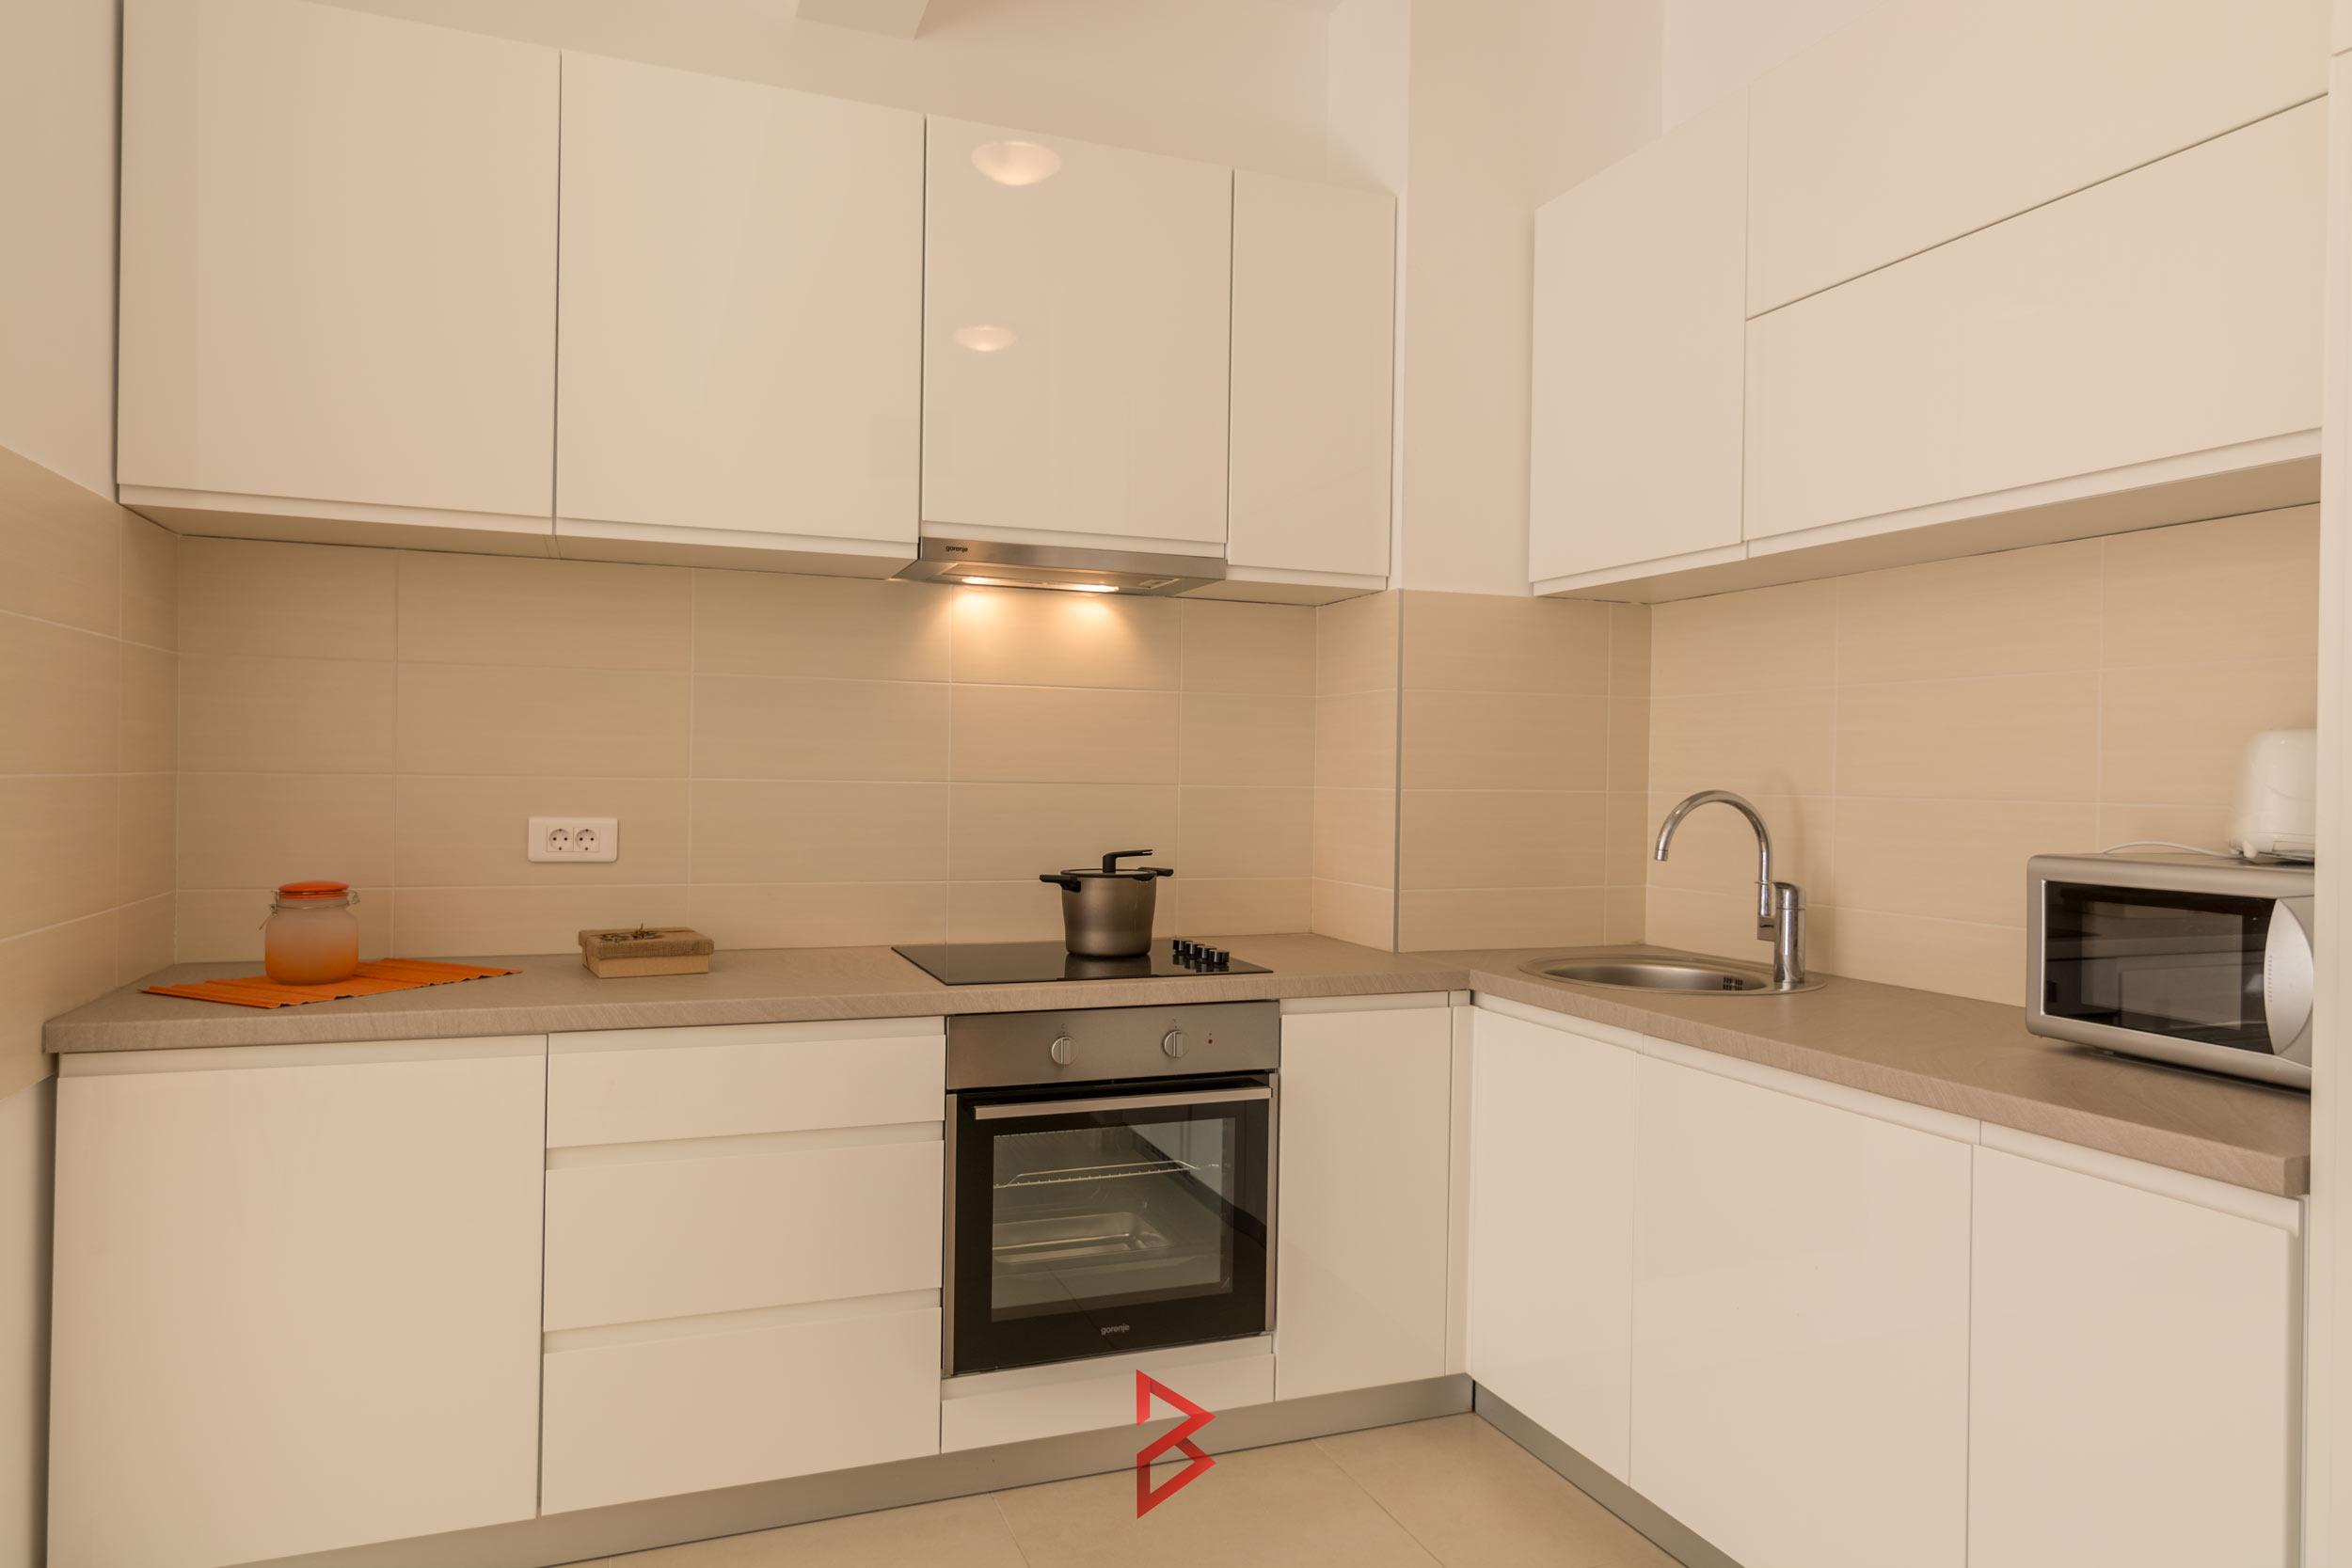 One bedroom apartment in Morinj